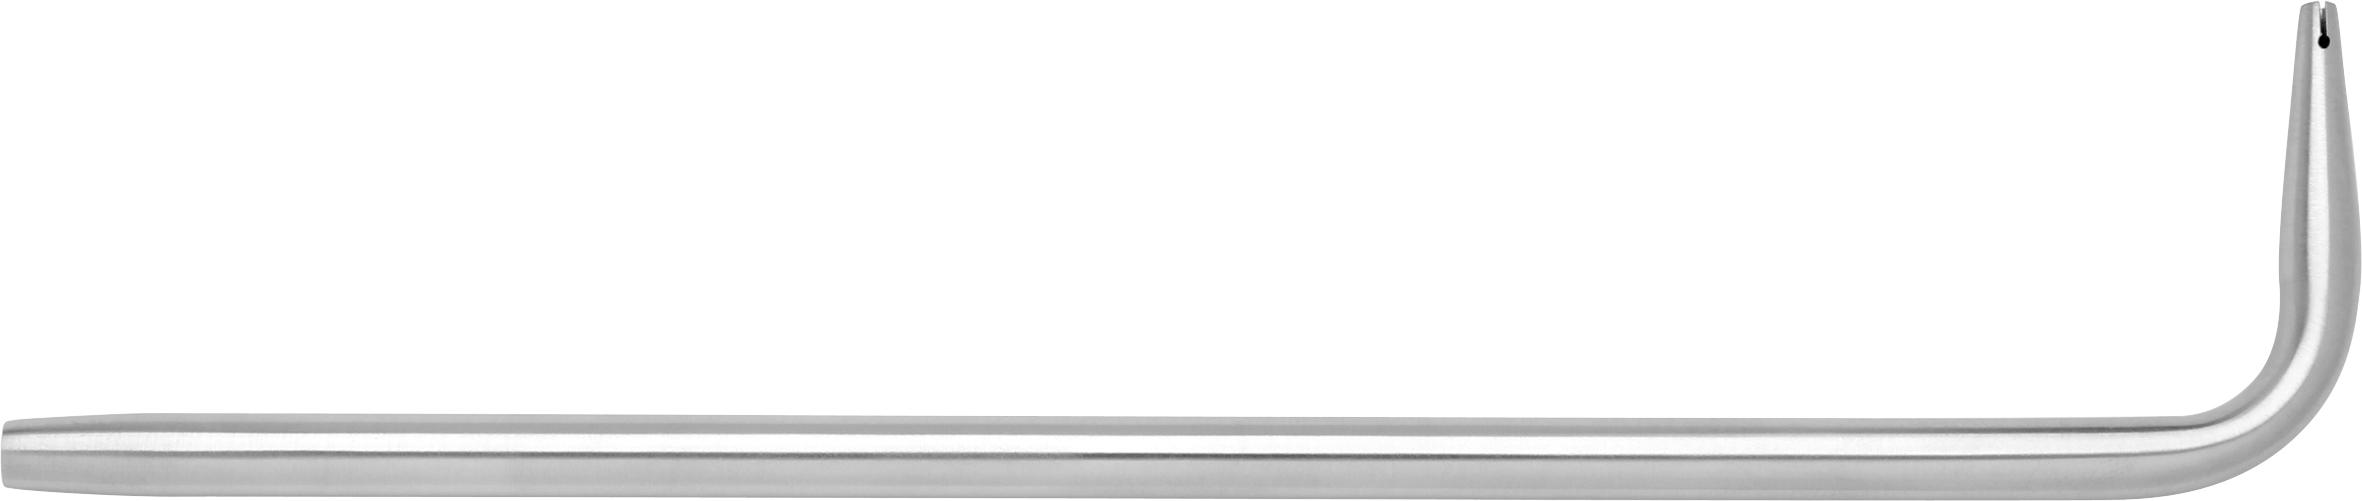 Chirurgischer Absauger Ø 3.0mm | 20.0cm